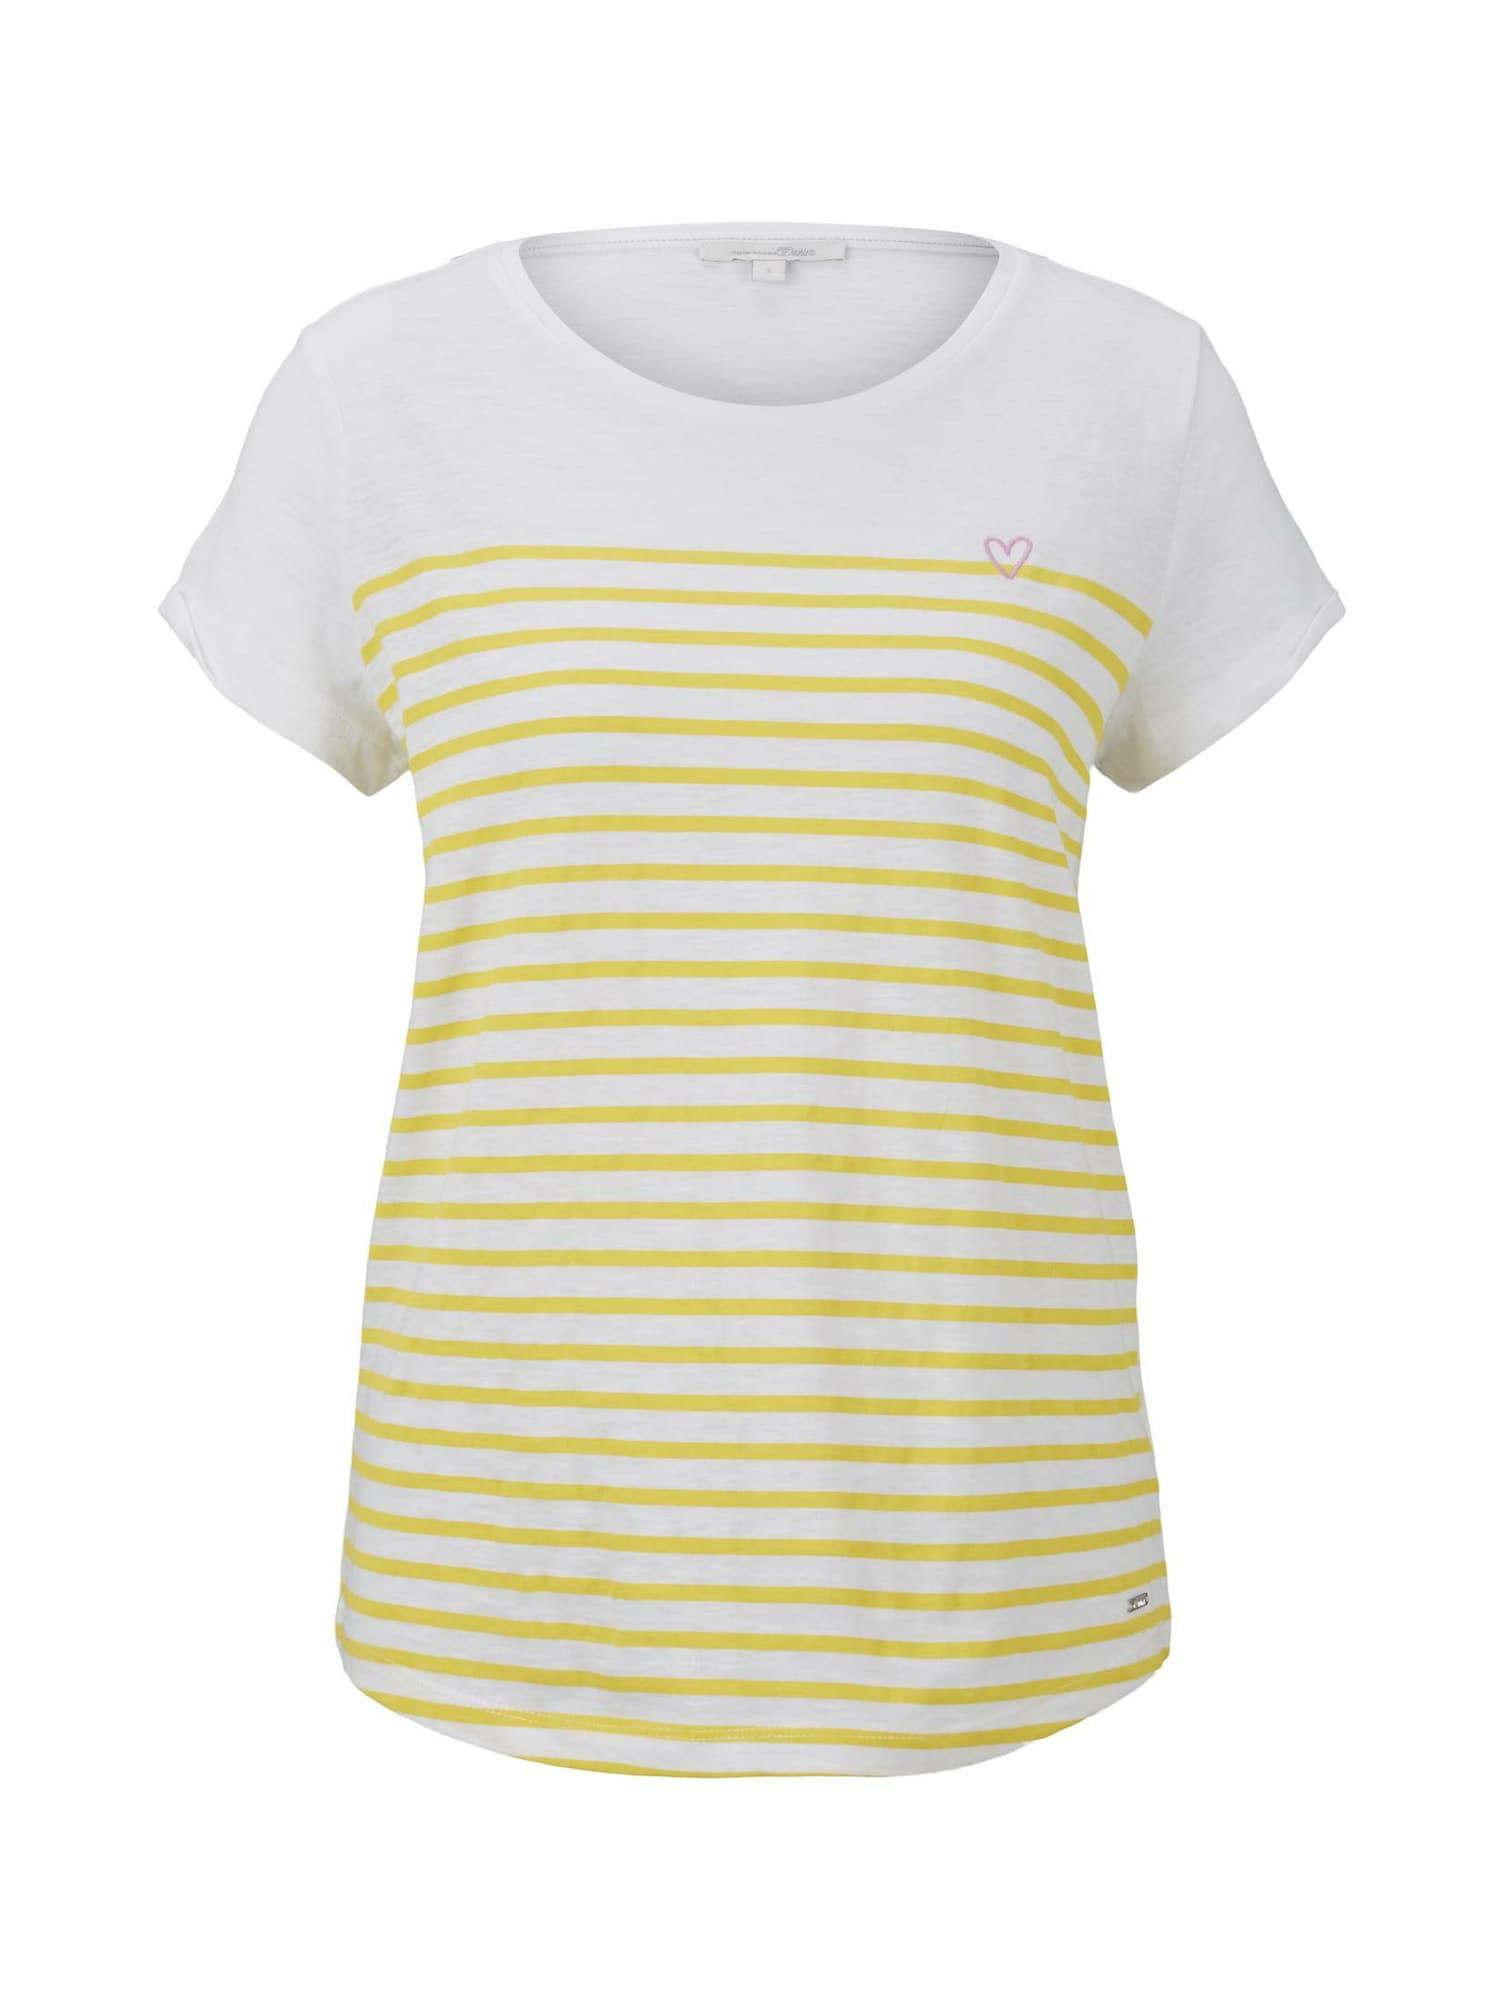 TOM TAILOR DENIM Tričko  biela / žltá